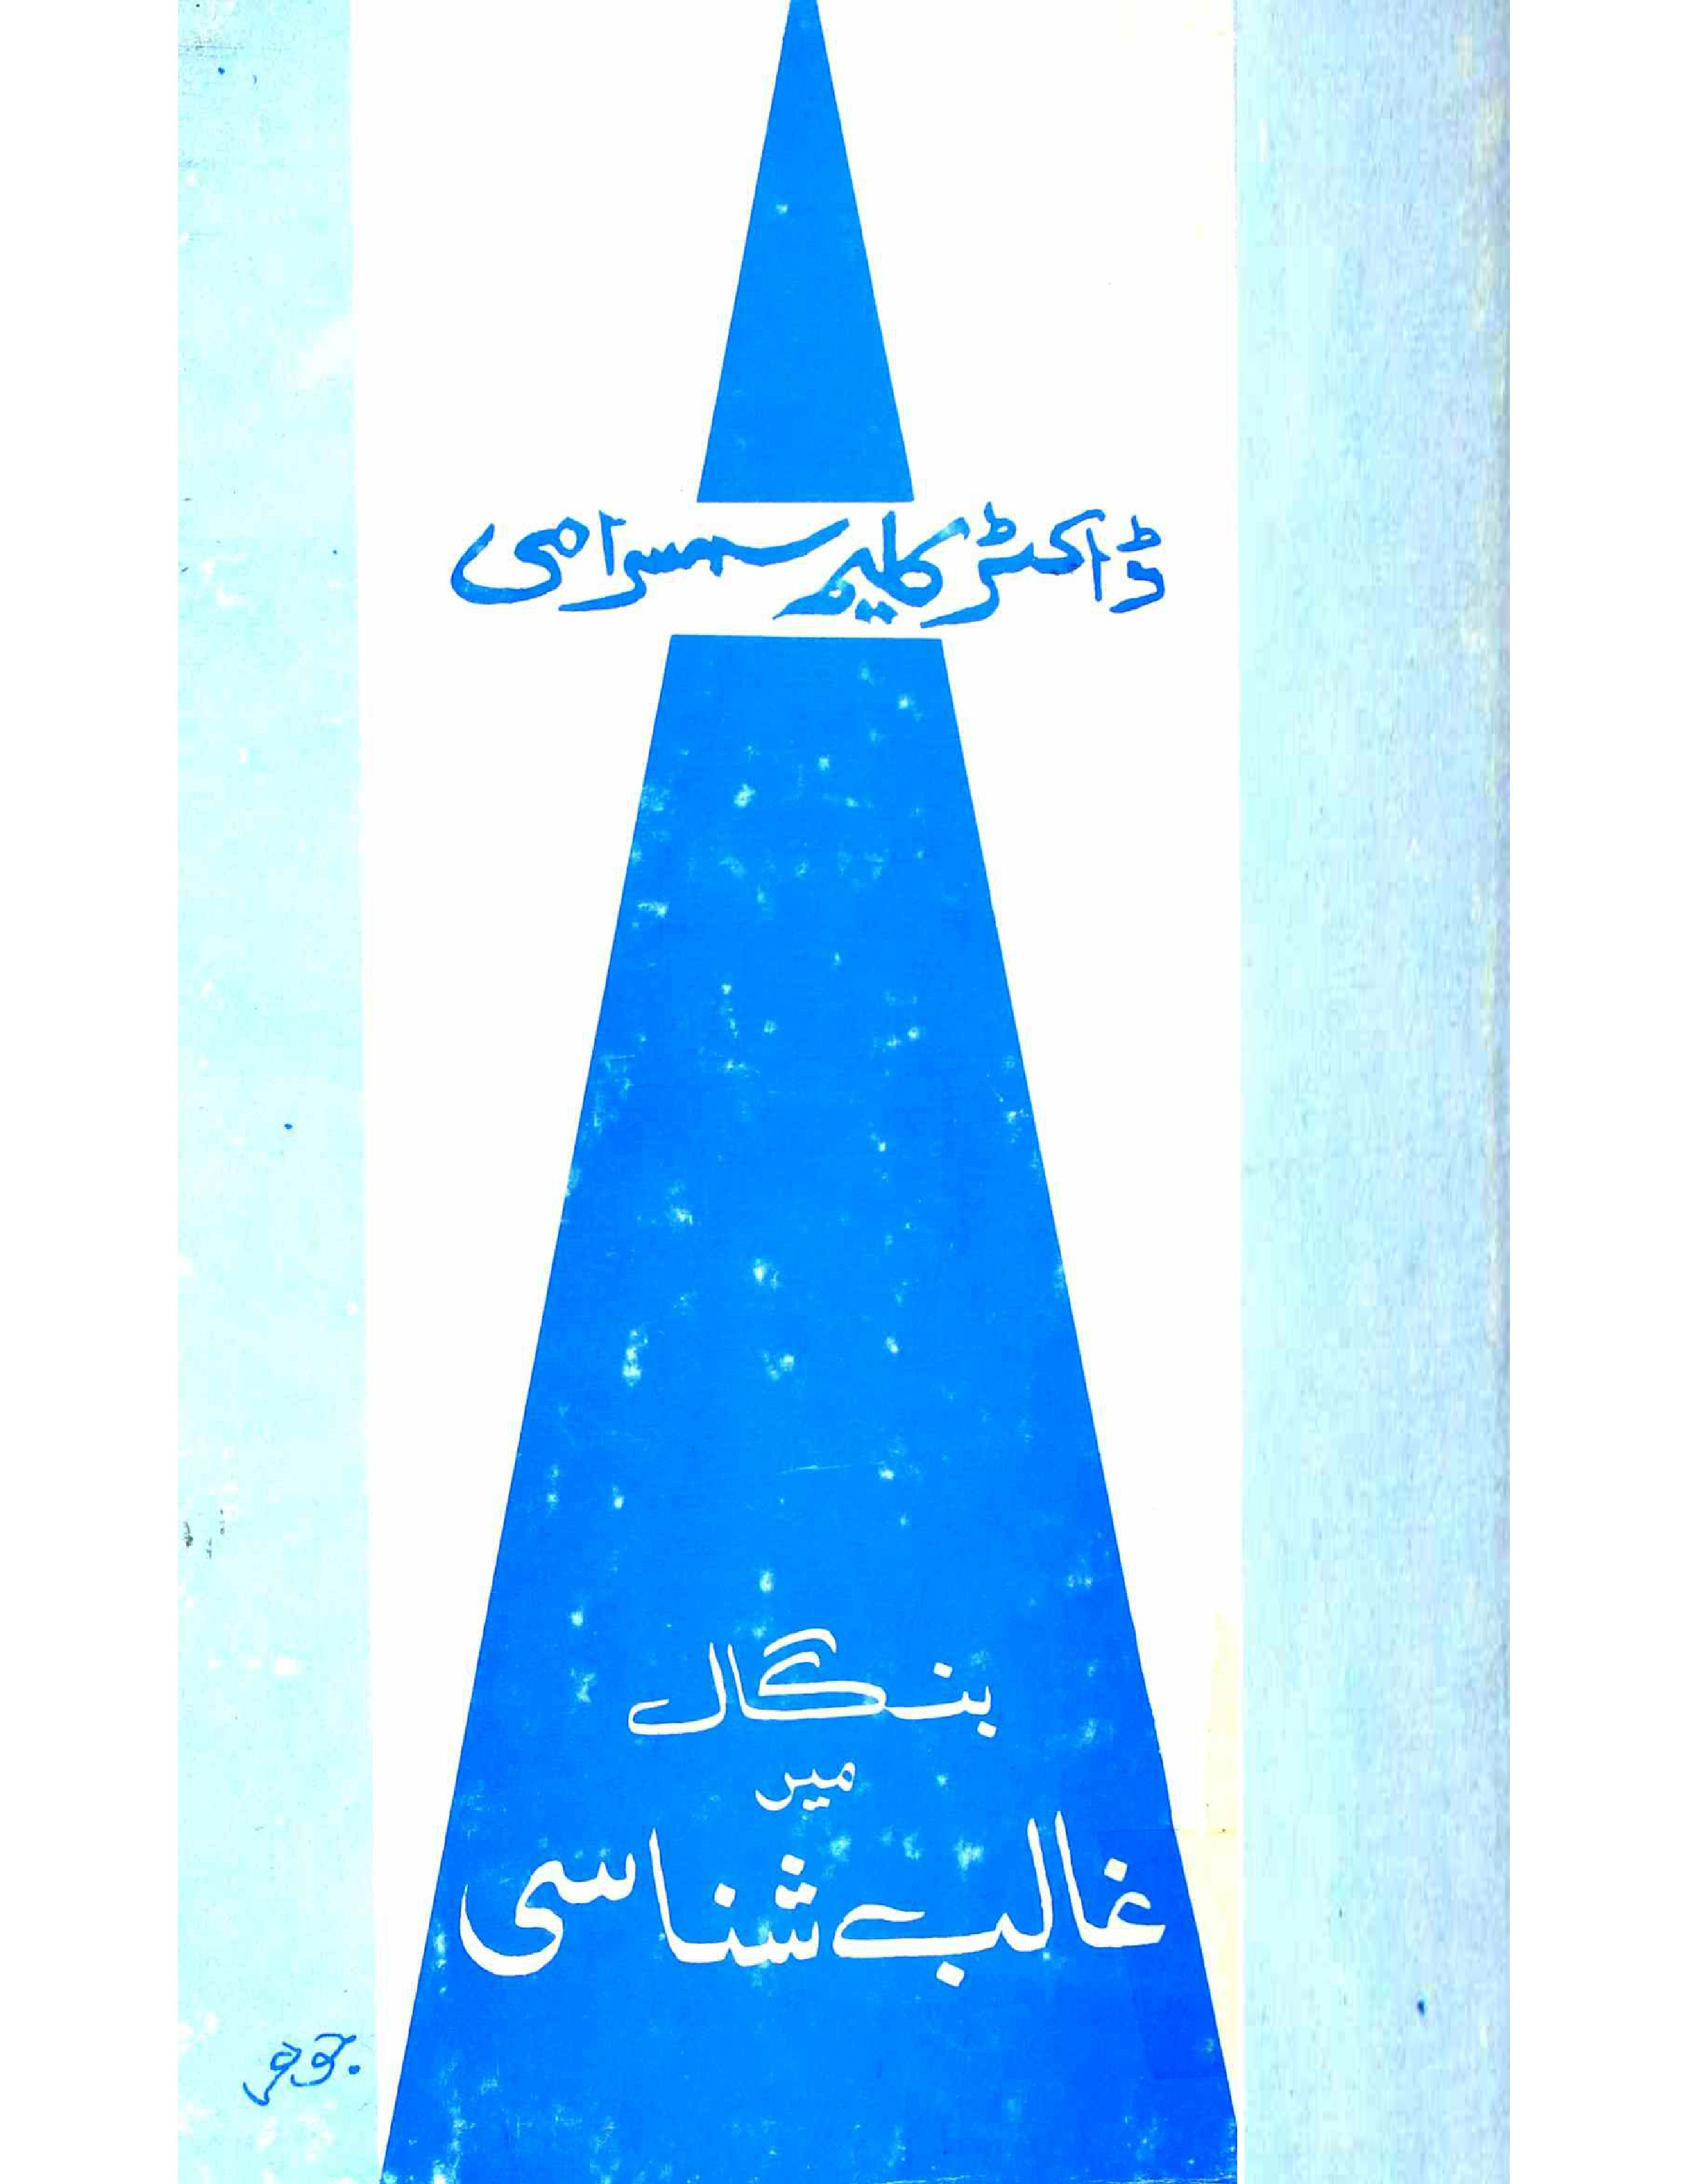 Bangal Mein Ghalib Shanasi